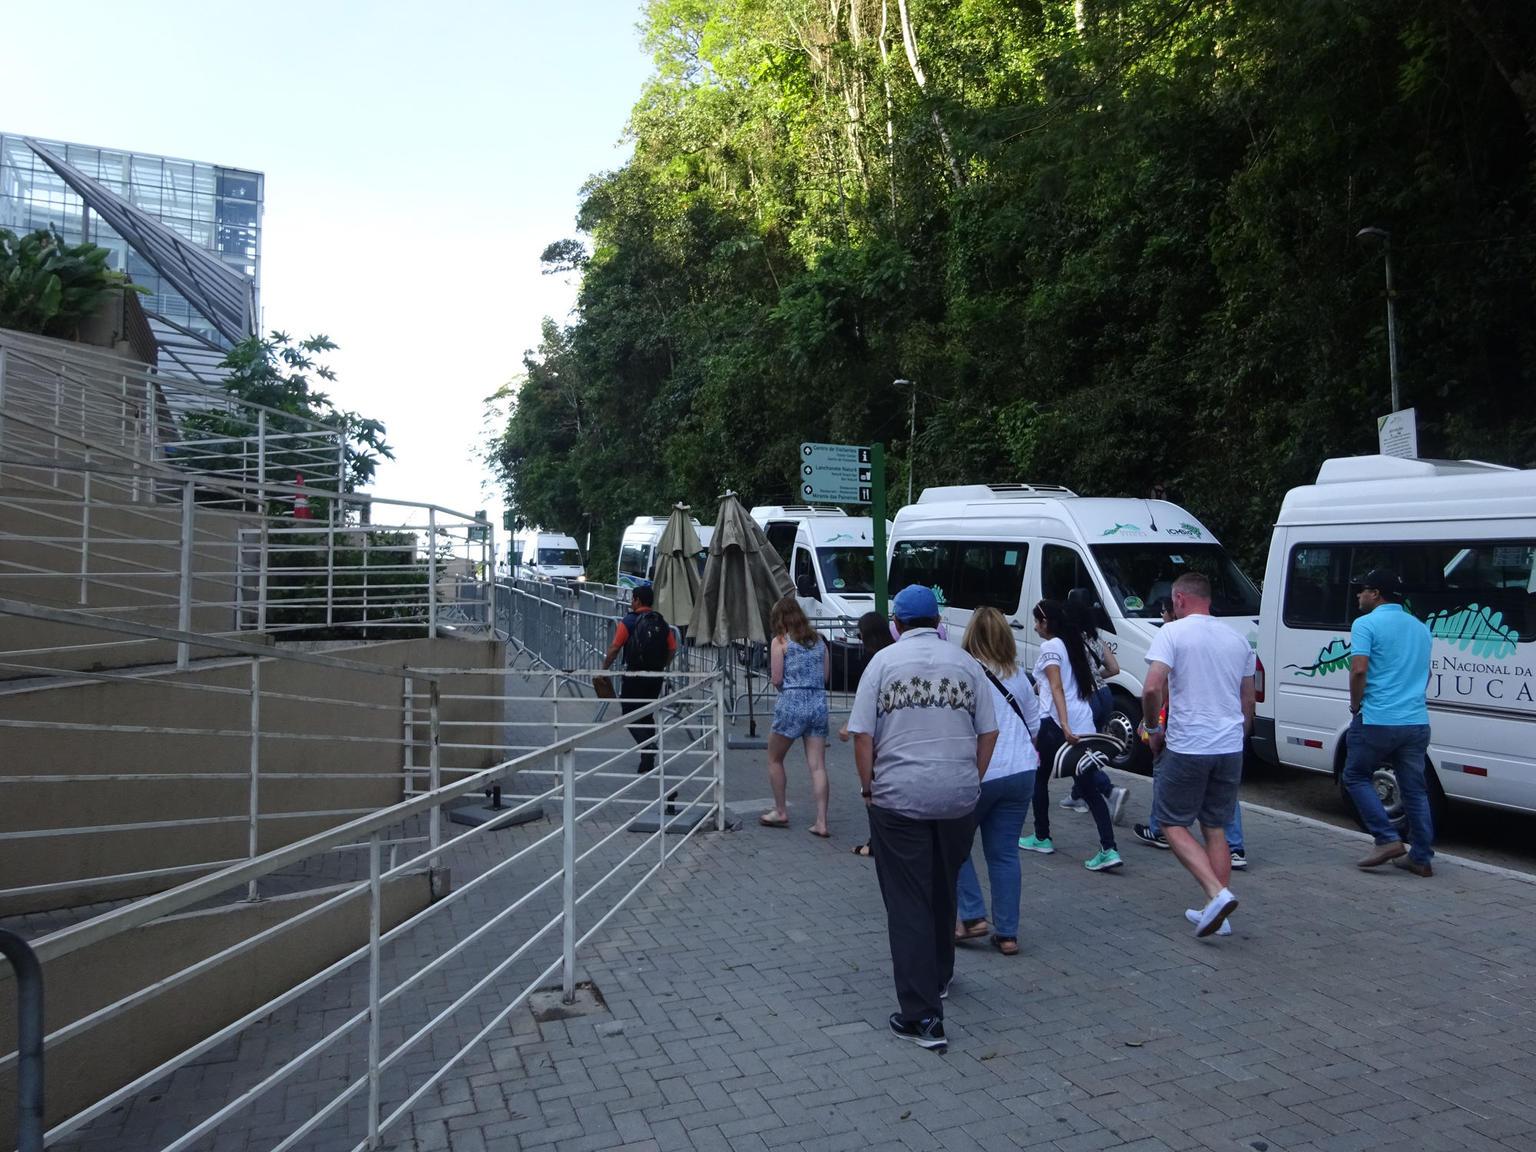 MORE PHOTOS, Full day tour of Rio de Janeiro